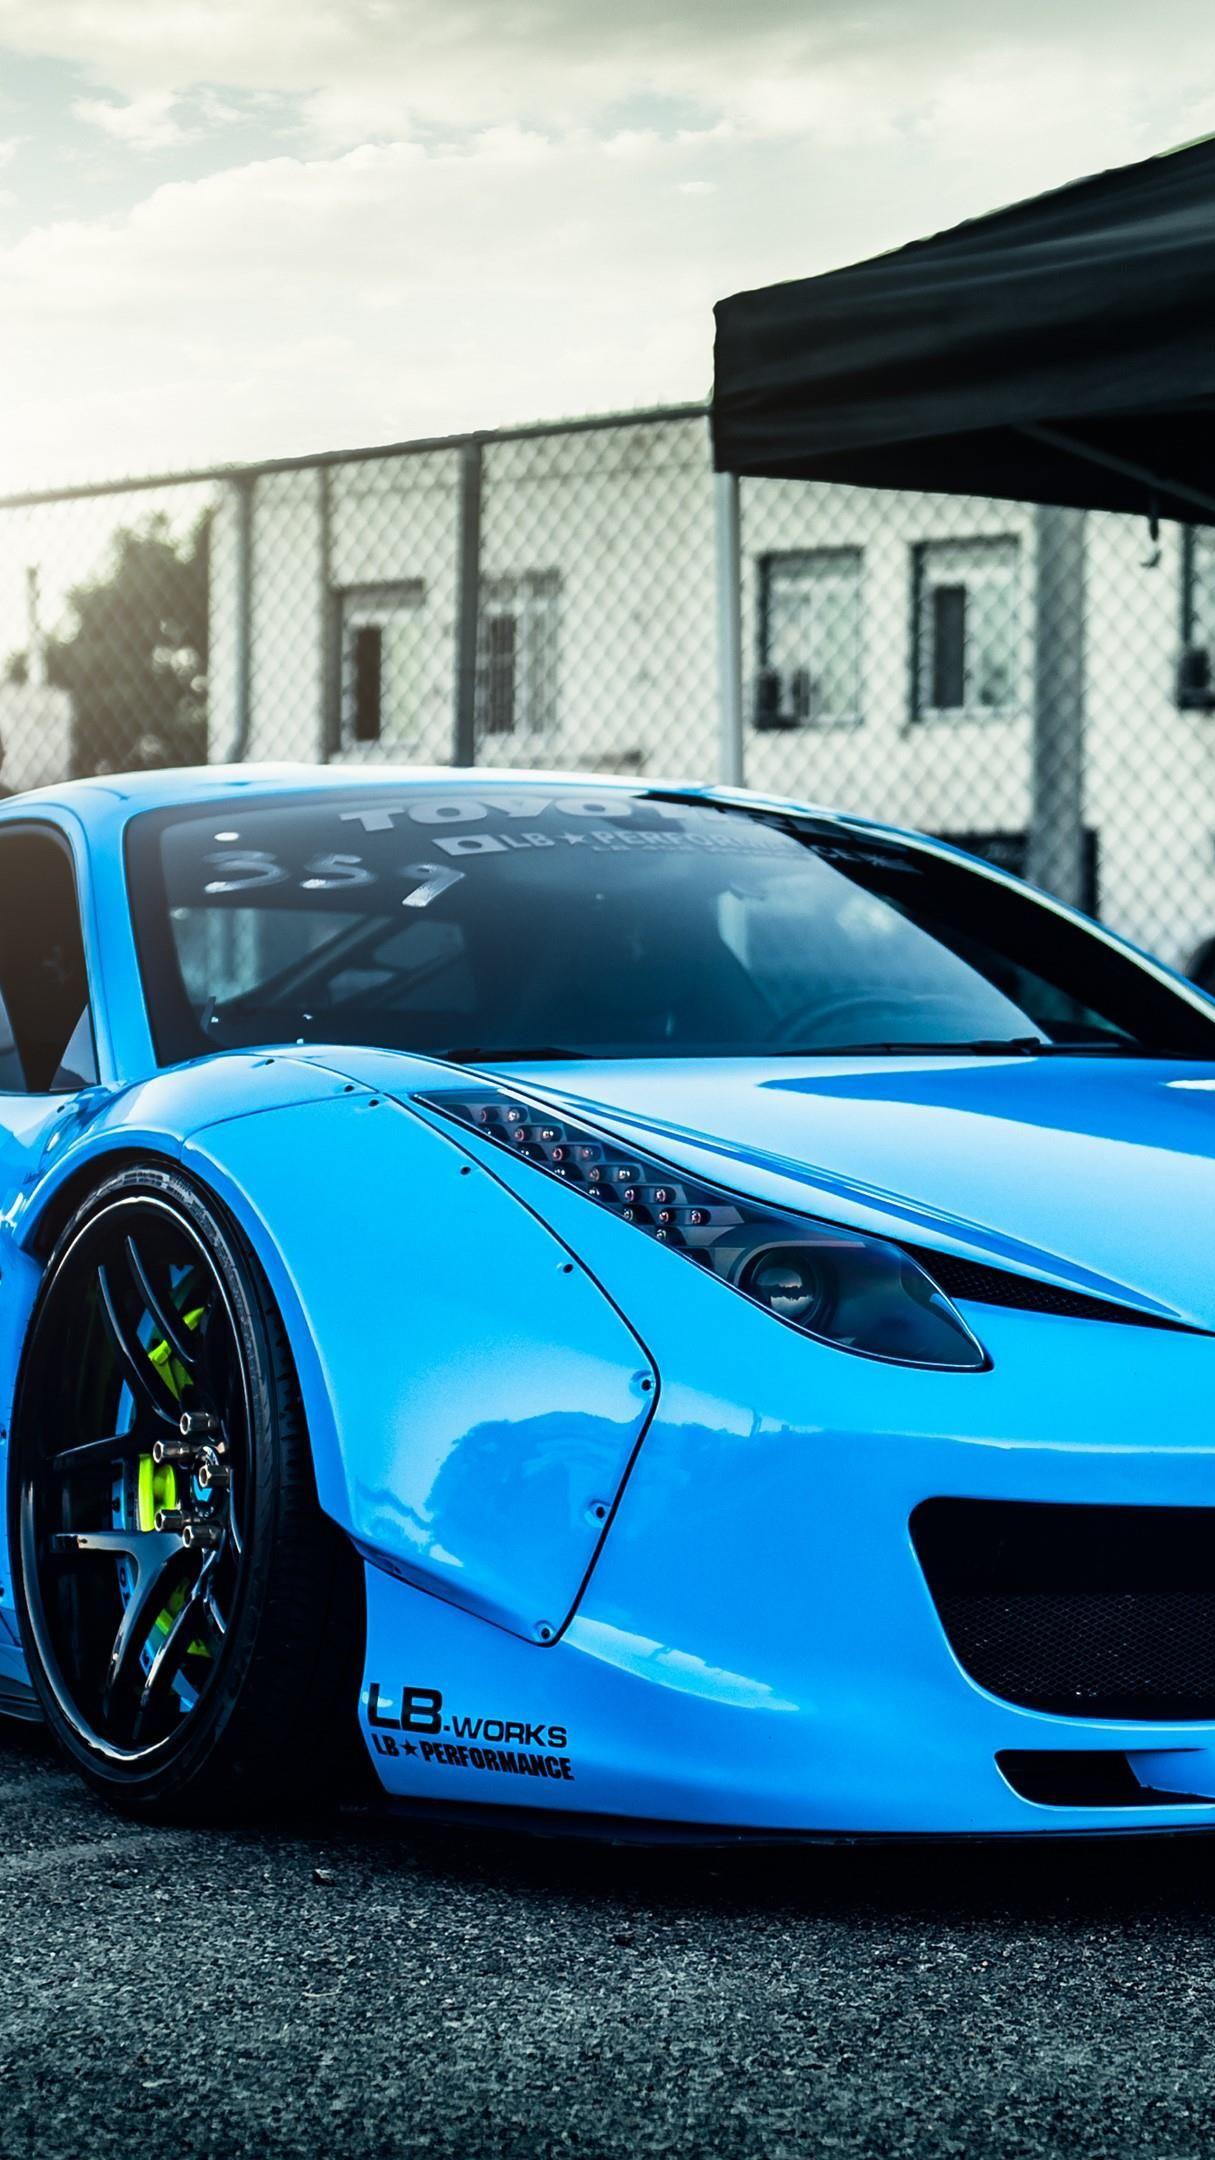 Blue Ferrari 458 4k Ultrahd Wallpaper Backiee Free Ultra Hd